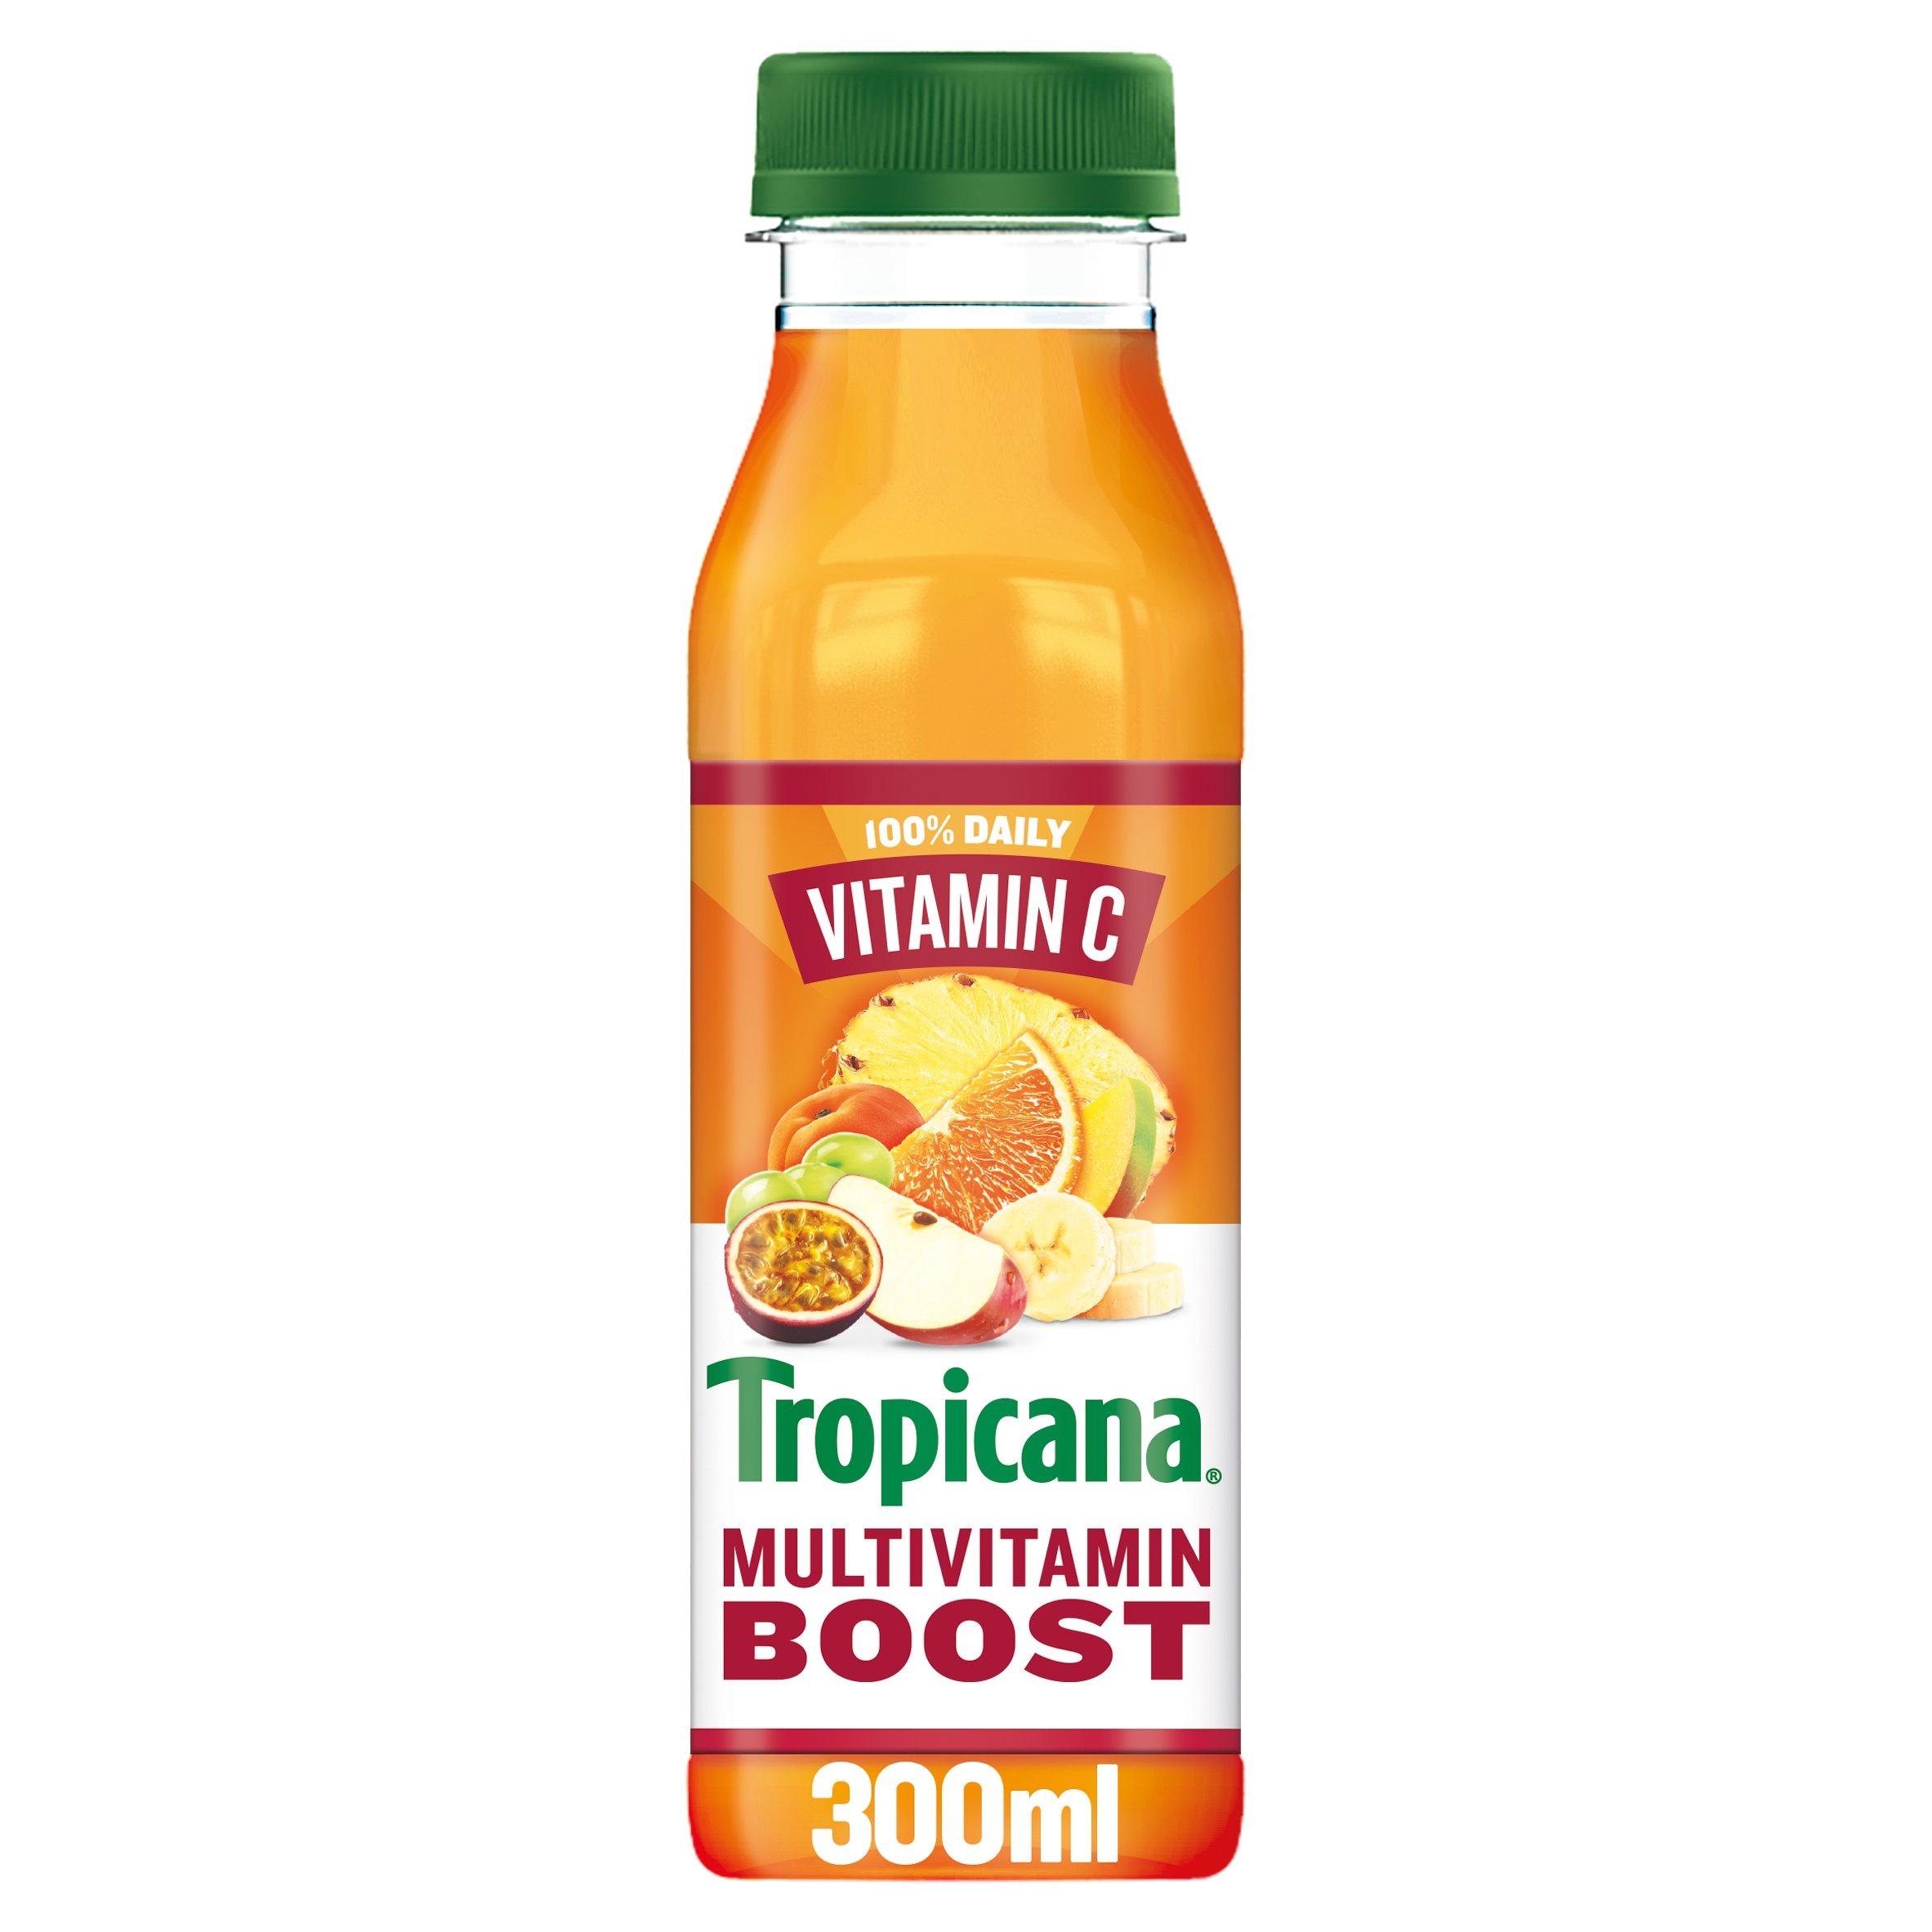 Tropicana Multivitamins 300Ml